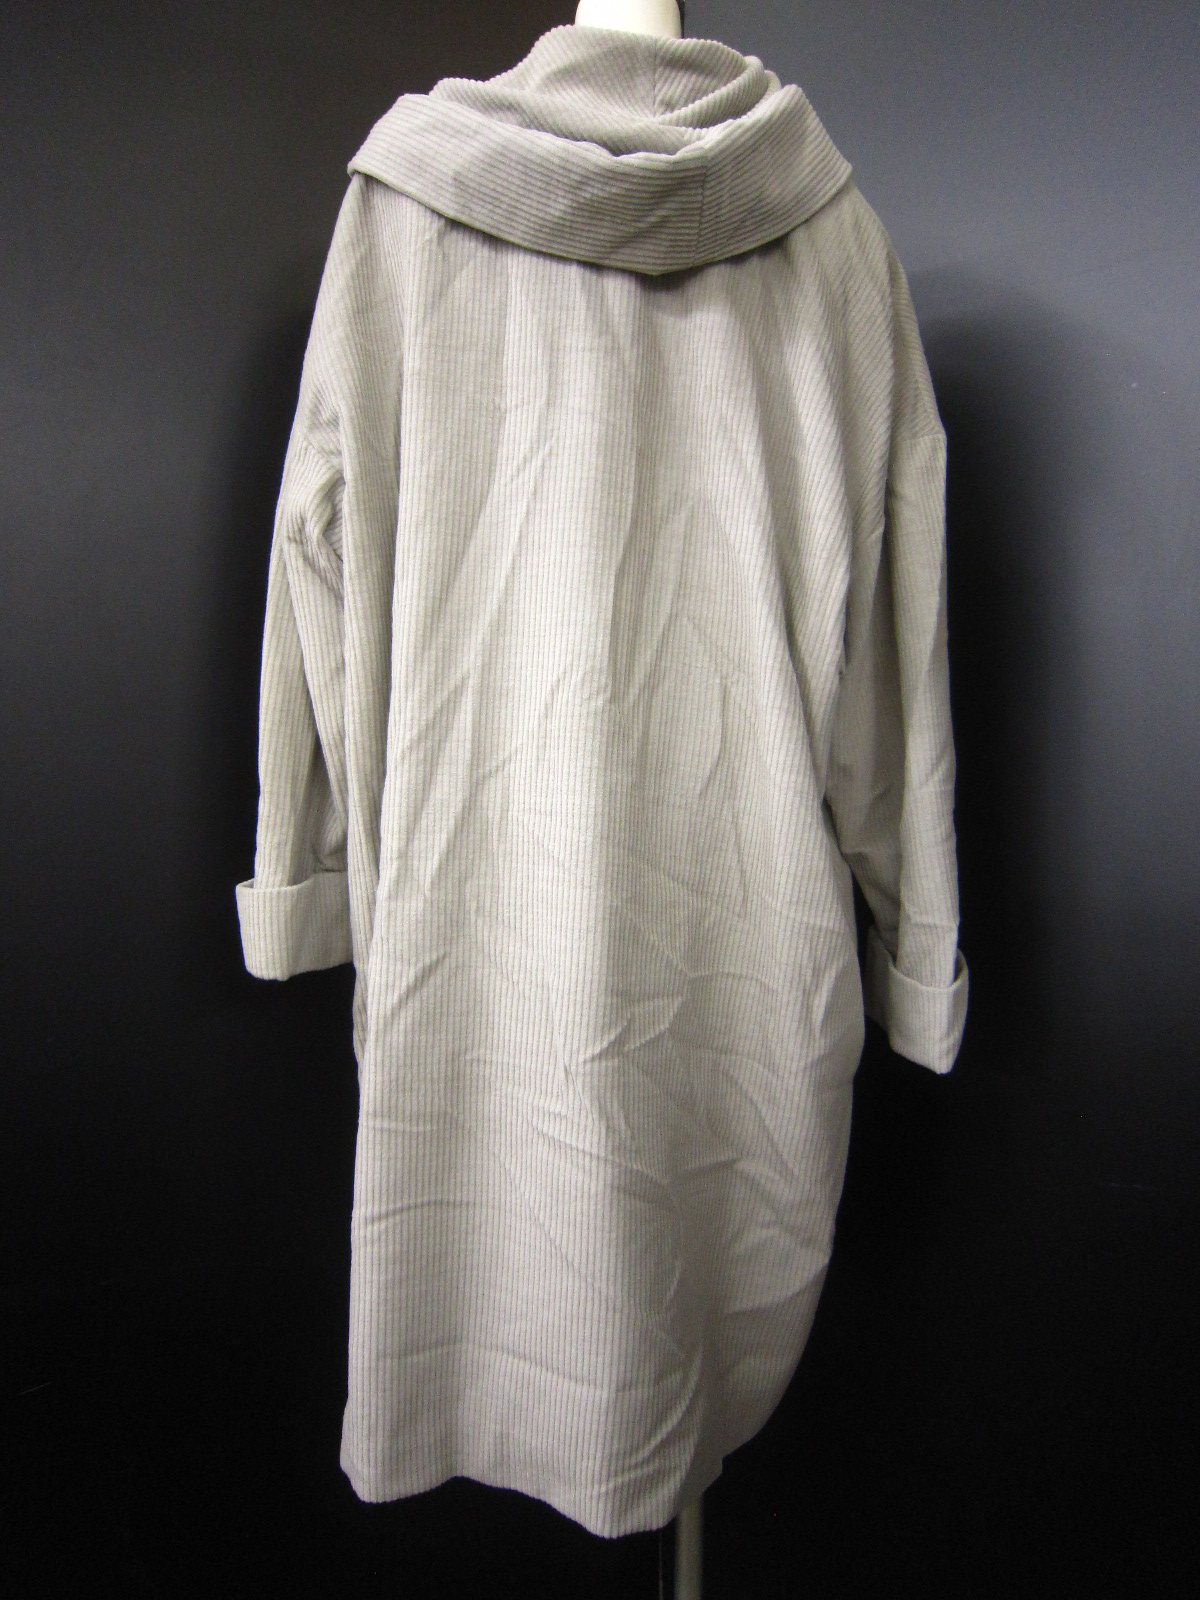 CORVO BIANCO(コルボビアンコ)のコート